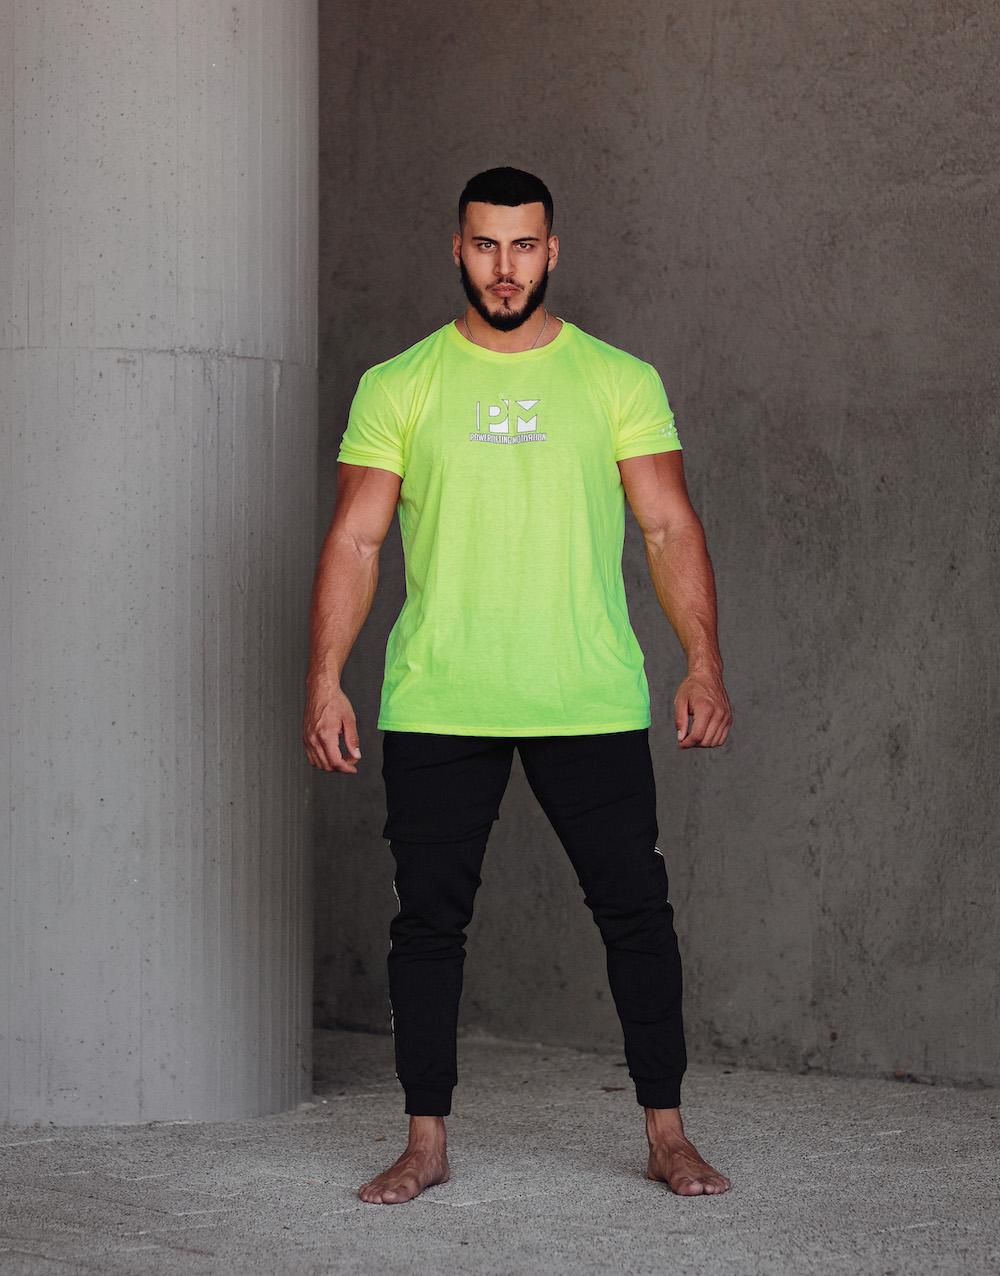 PM neon green